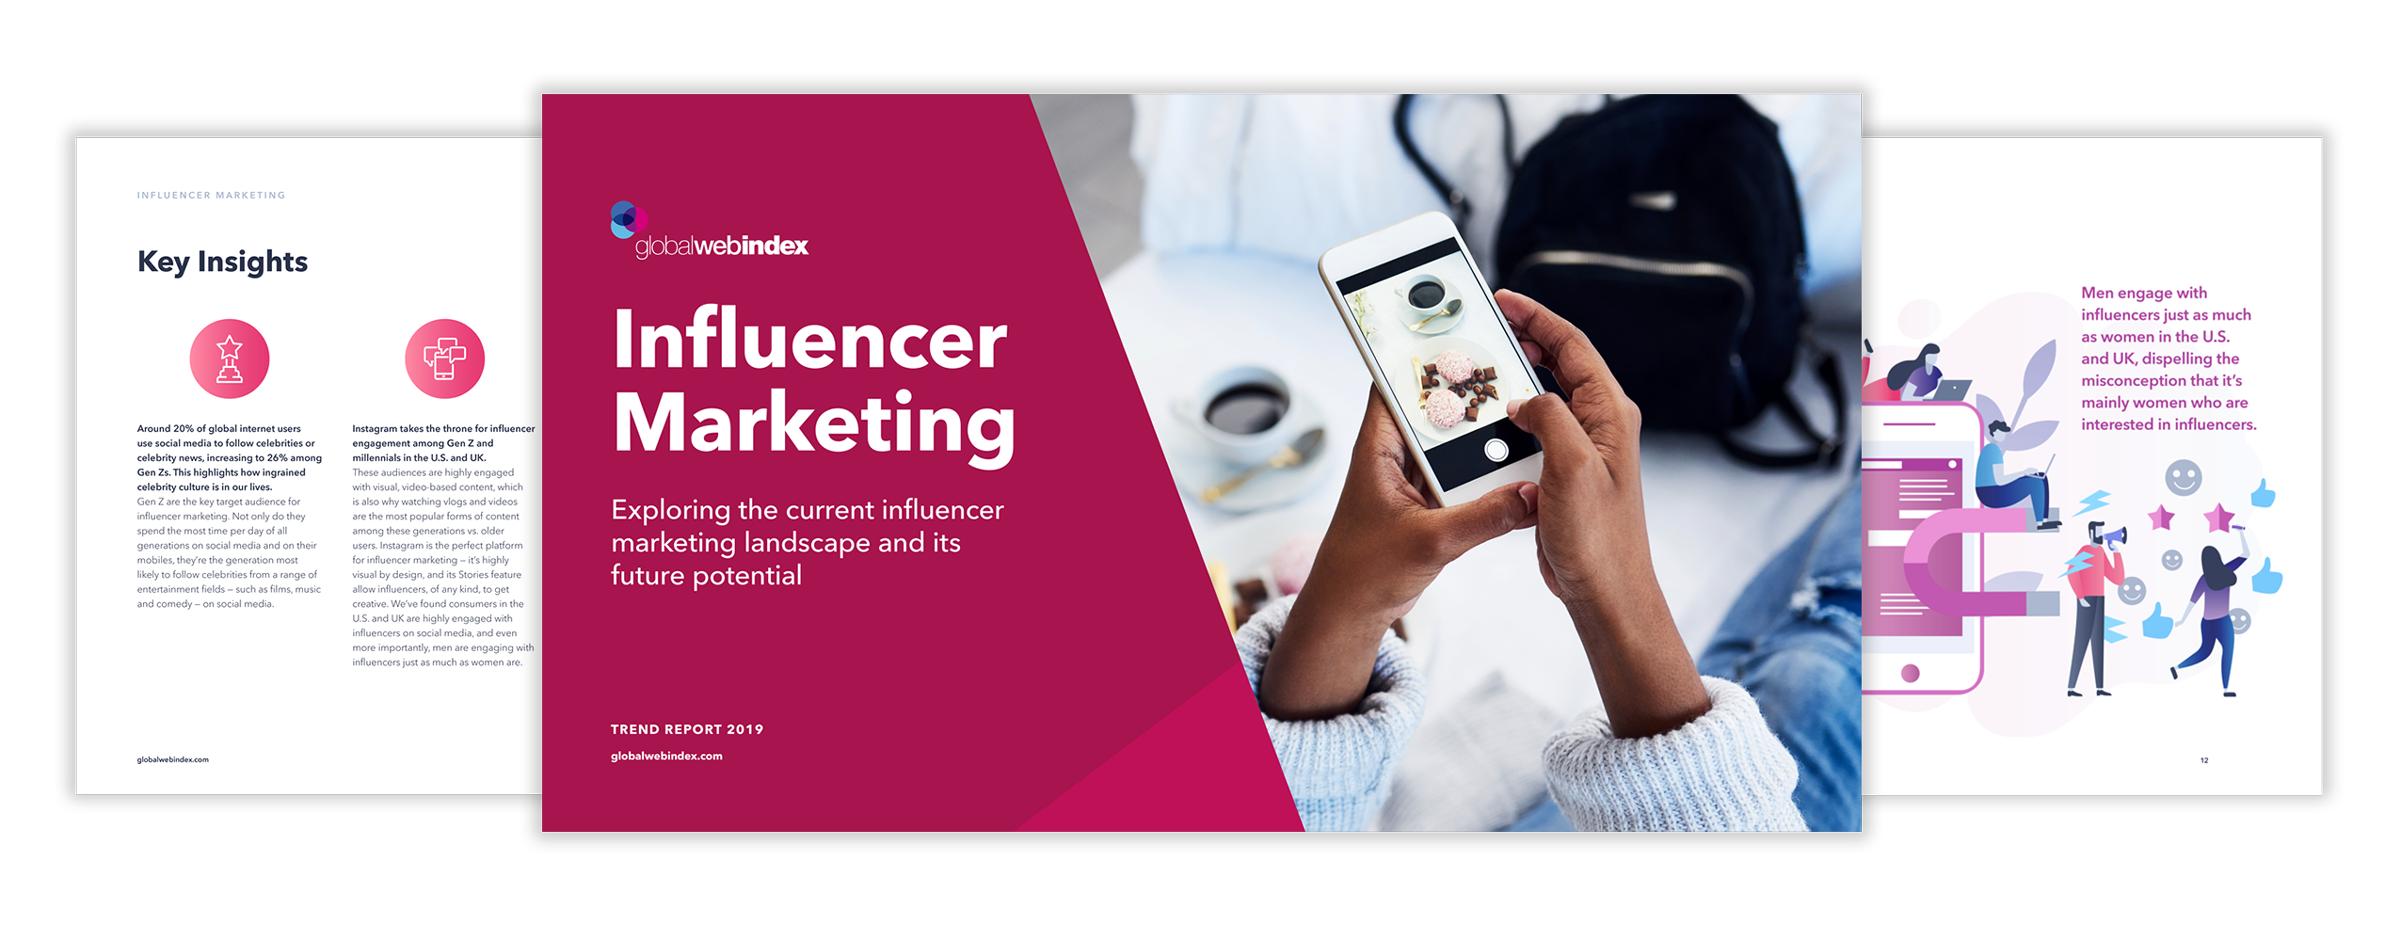 Influencer-marketing-report-preview-1200